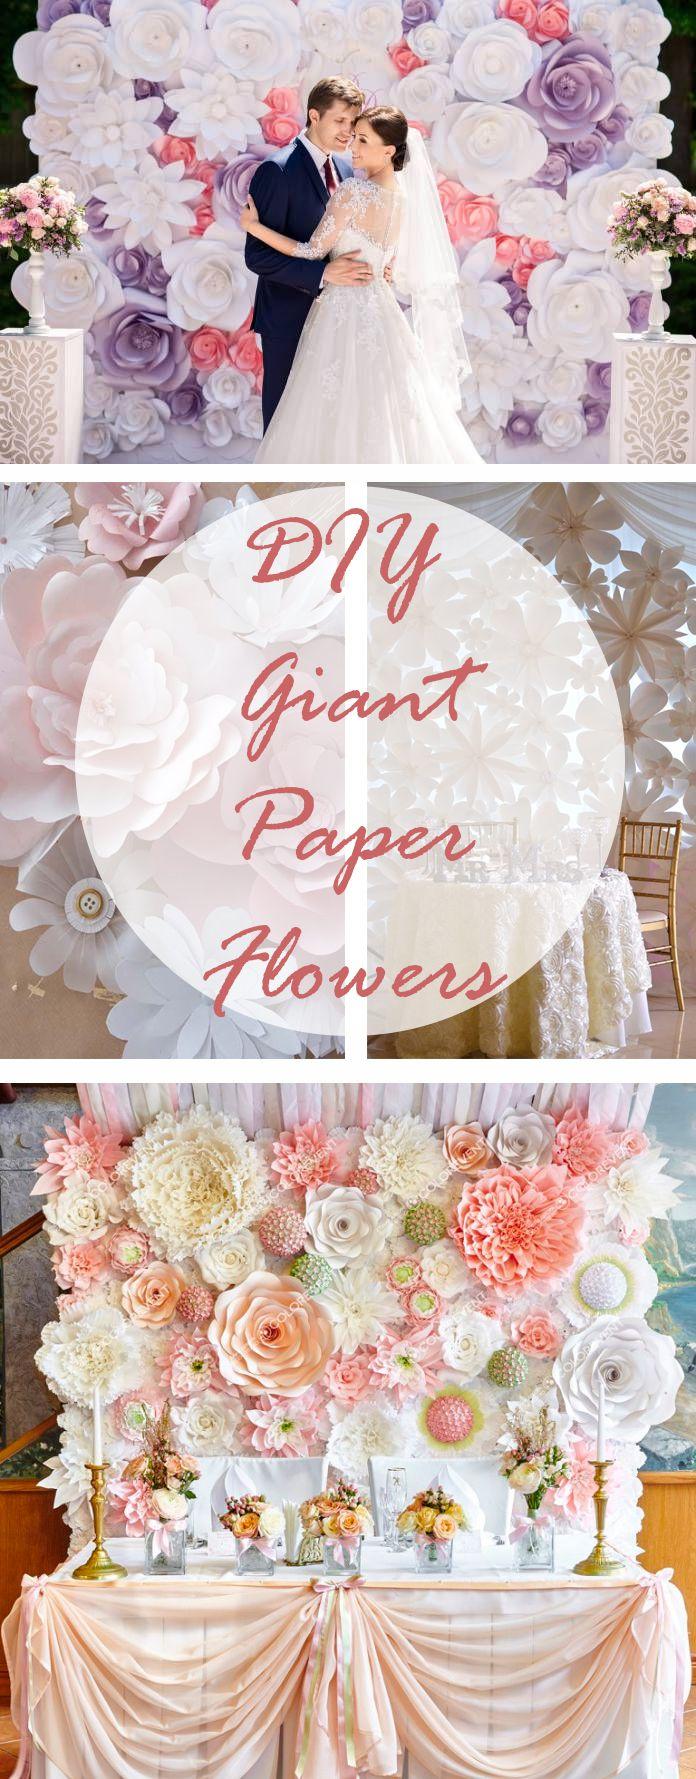 weddingdecoration paperflowers wedding flowers